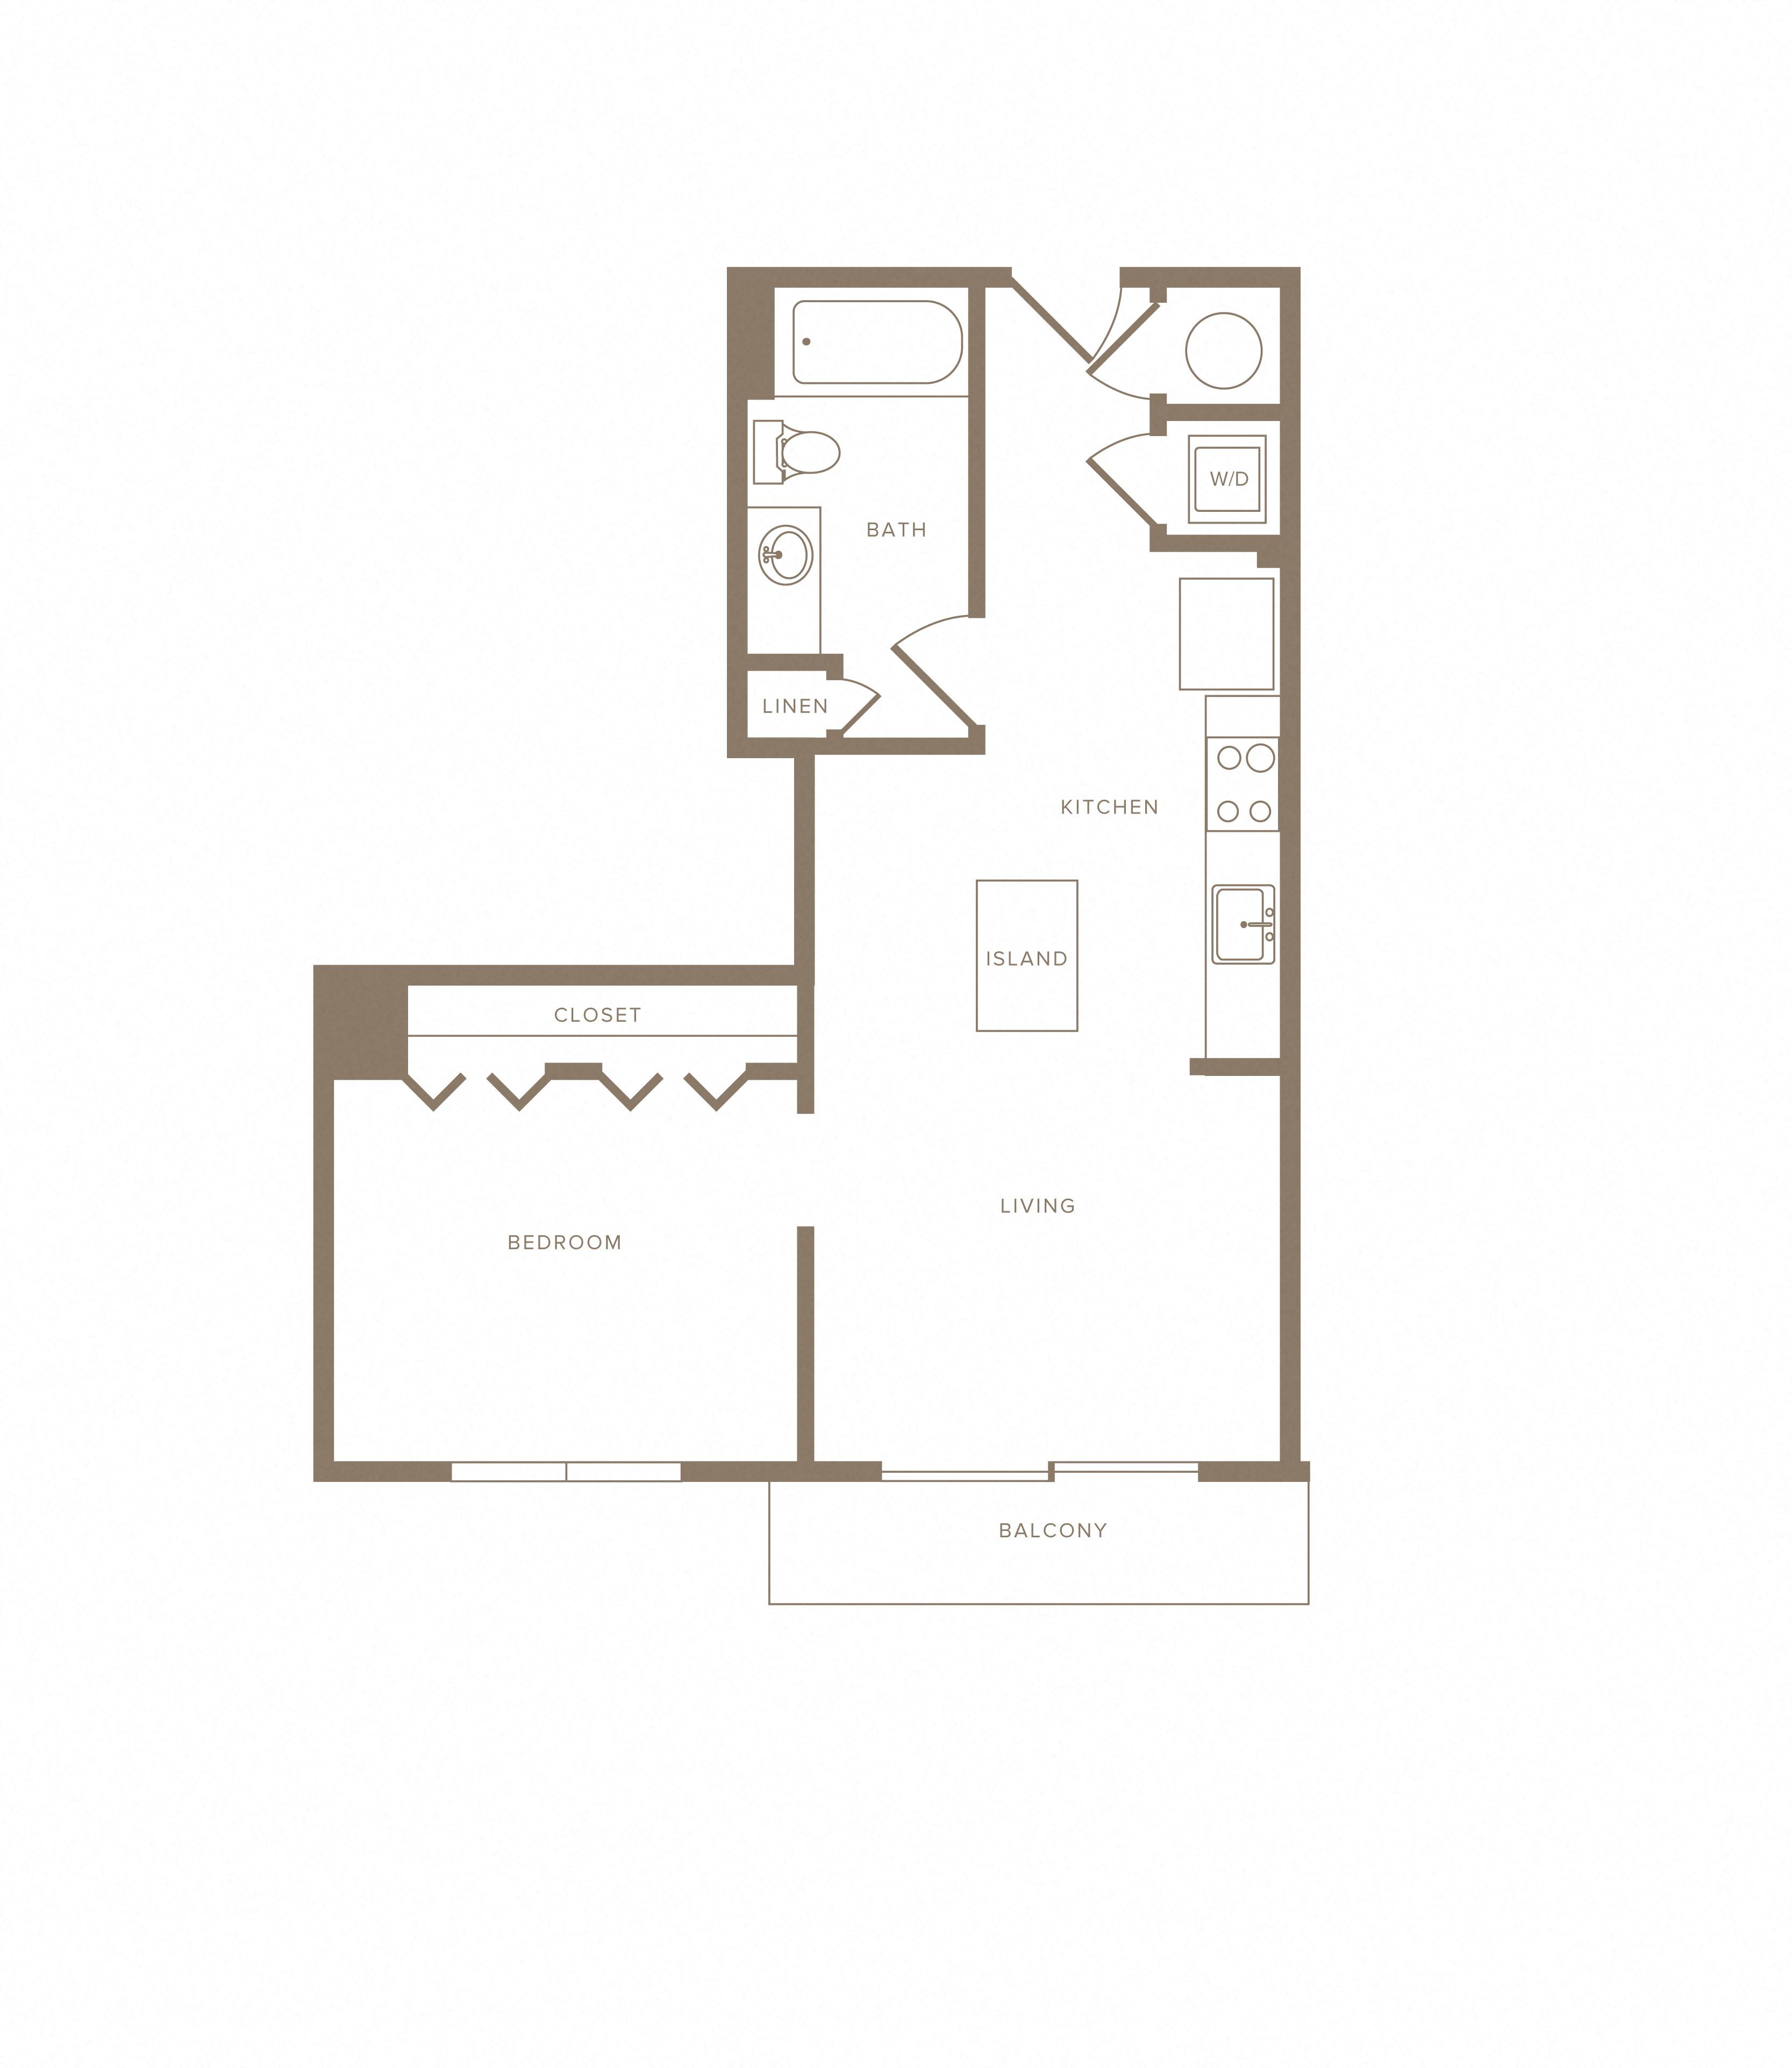 Apartment F-809 floorplan